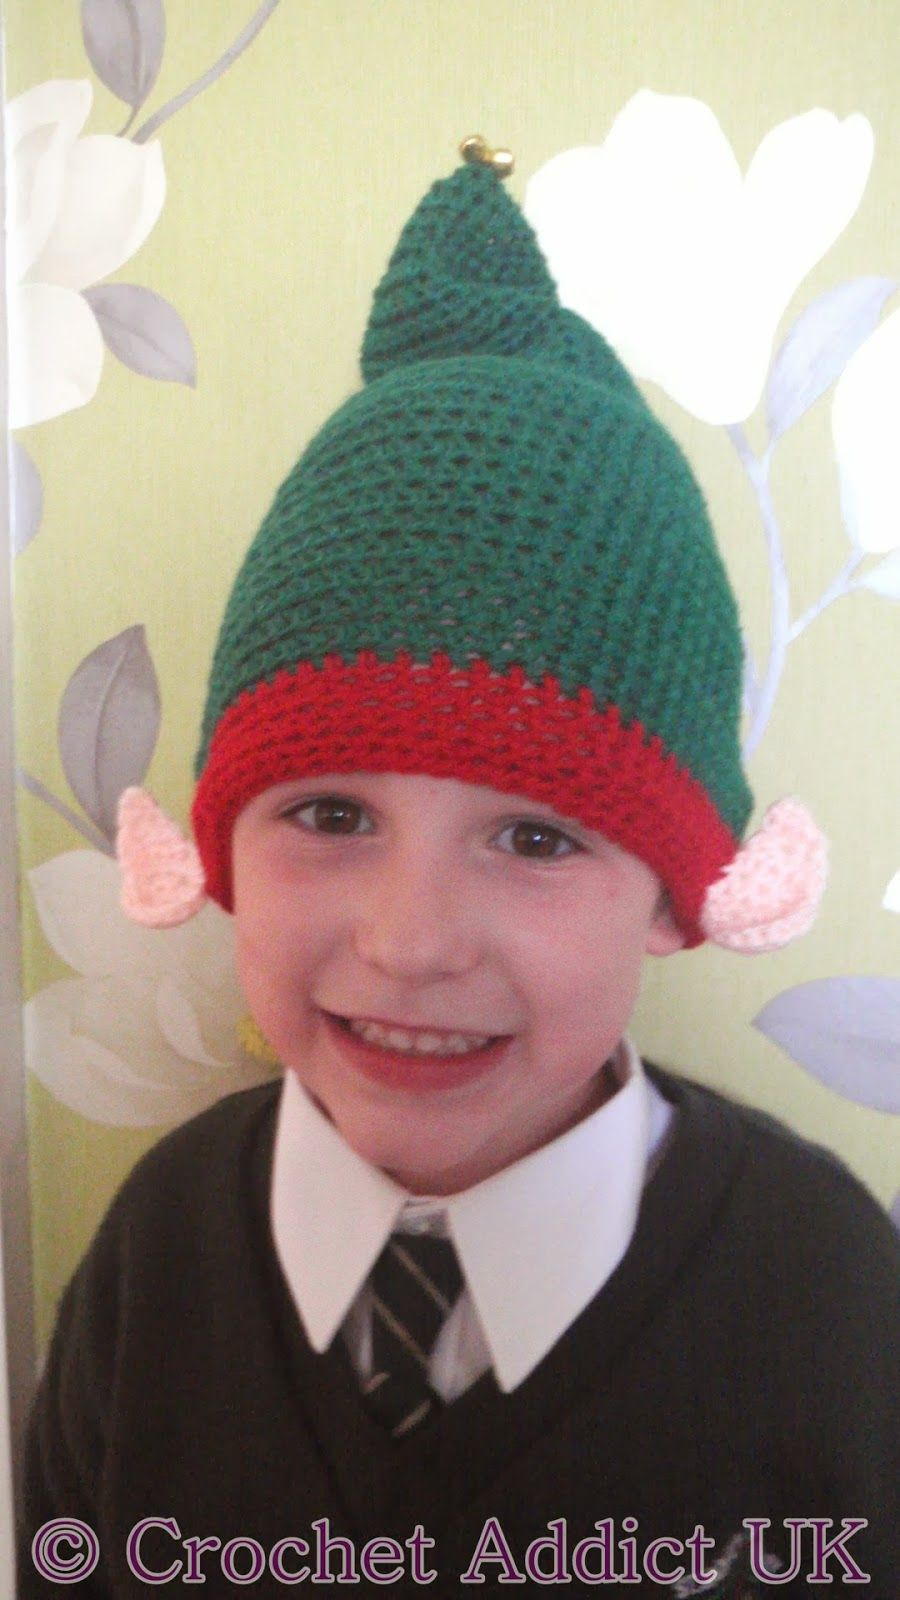 A blog about Crochet, Crafts, Handmade, Books, Dyslexia, Education ...